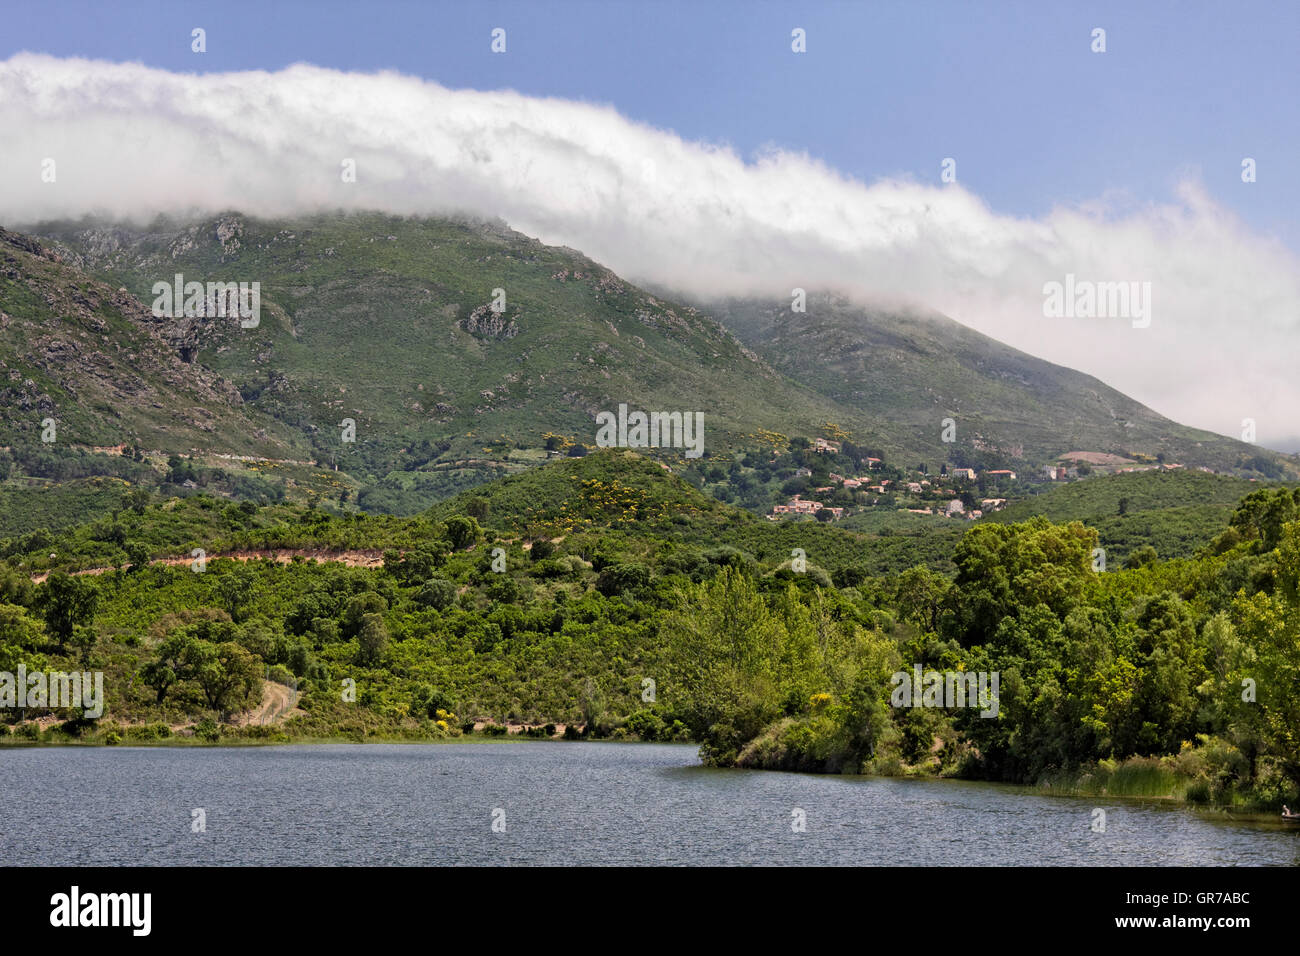 Lac De Padula Padula Lake Near The Mountain Village Oletta In The Nebbio Region, Northern Corsica, France, Europe Stock Photo